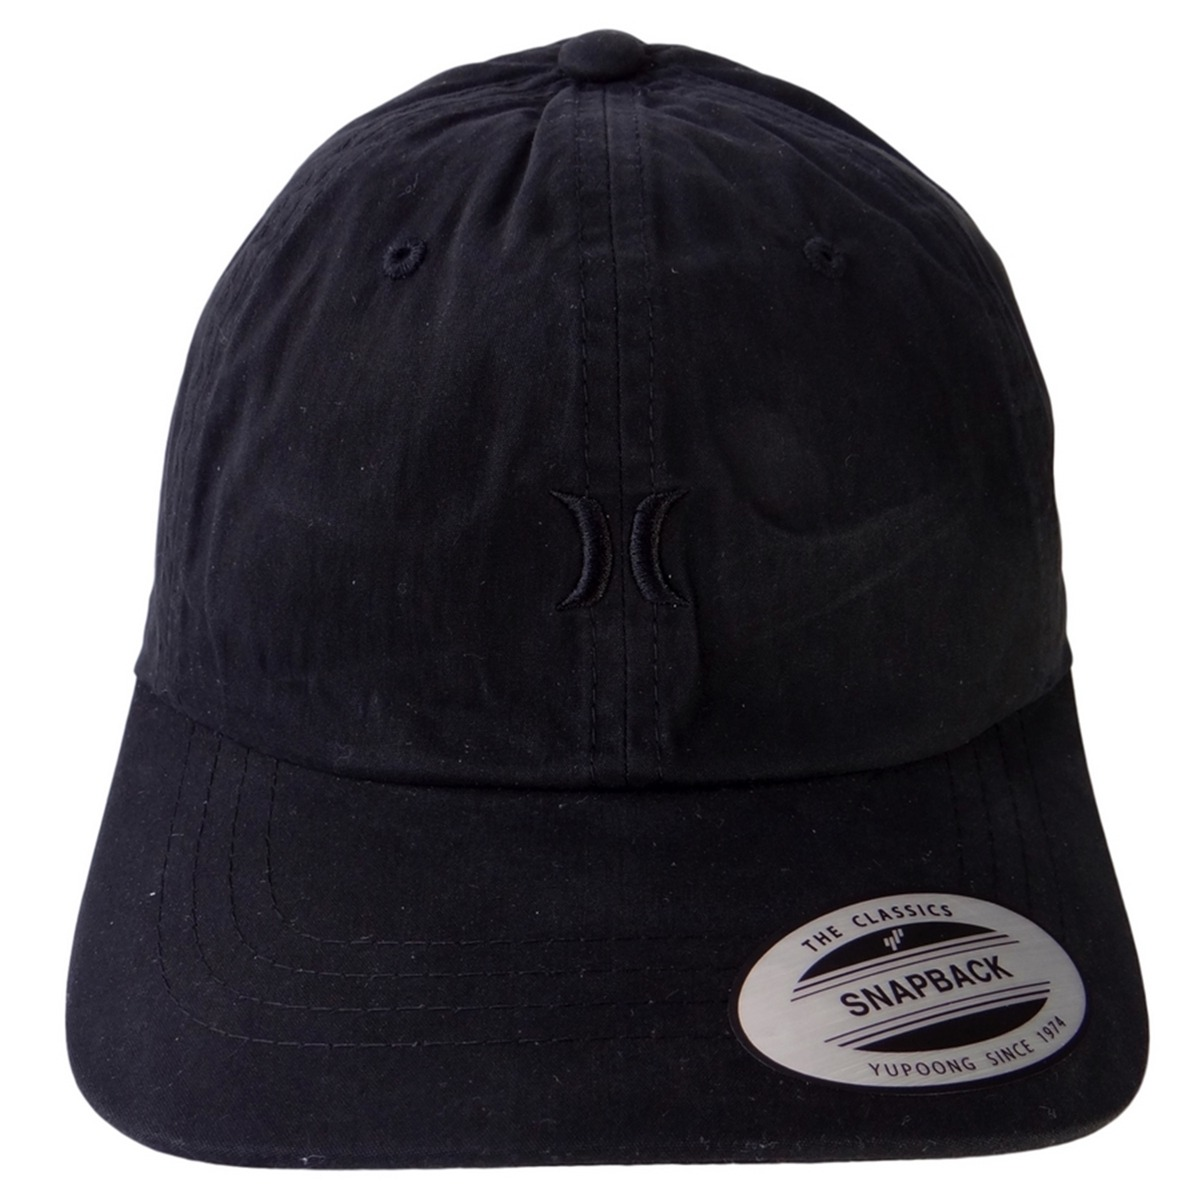 Gorra Hurley Chiller Hats Ffit In -   99.900 en Mercado Libre f256e04c77d